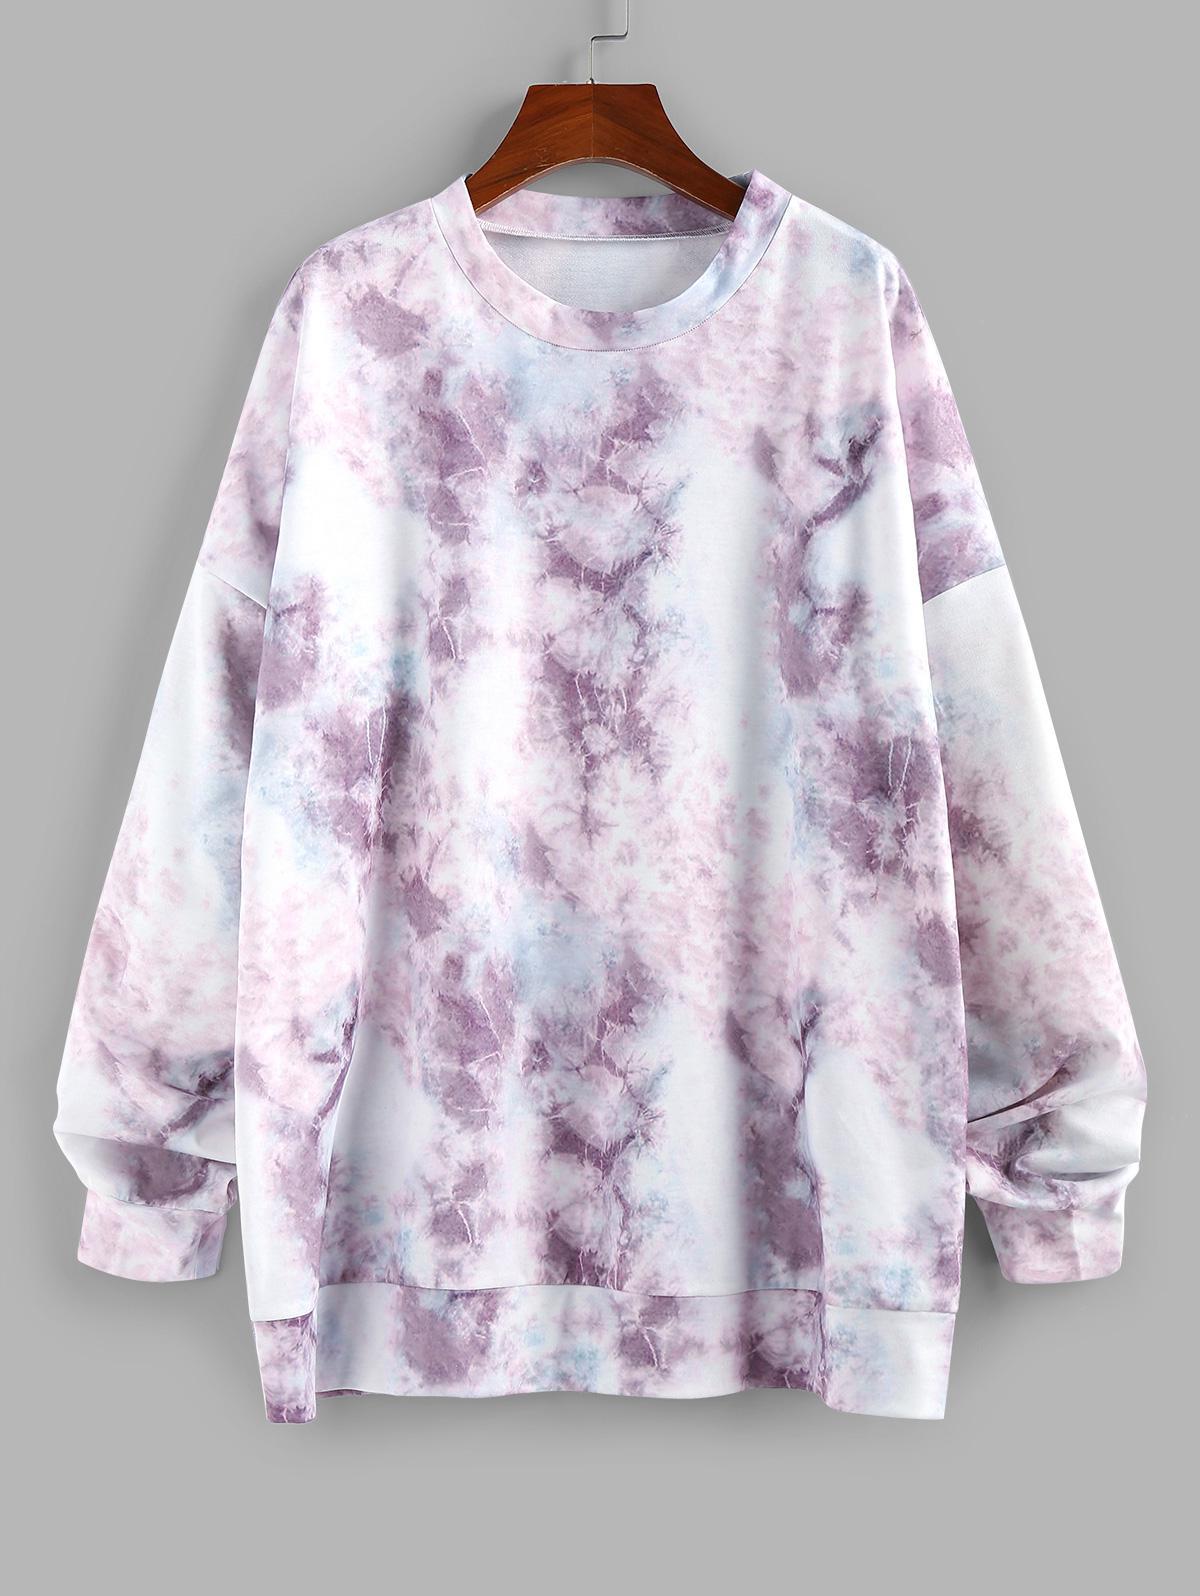 ZAFUL Oversized Marble Drop Shoulder Sweatshirt